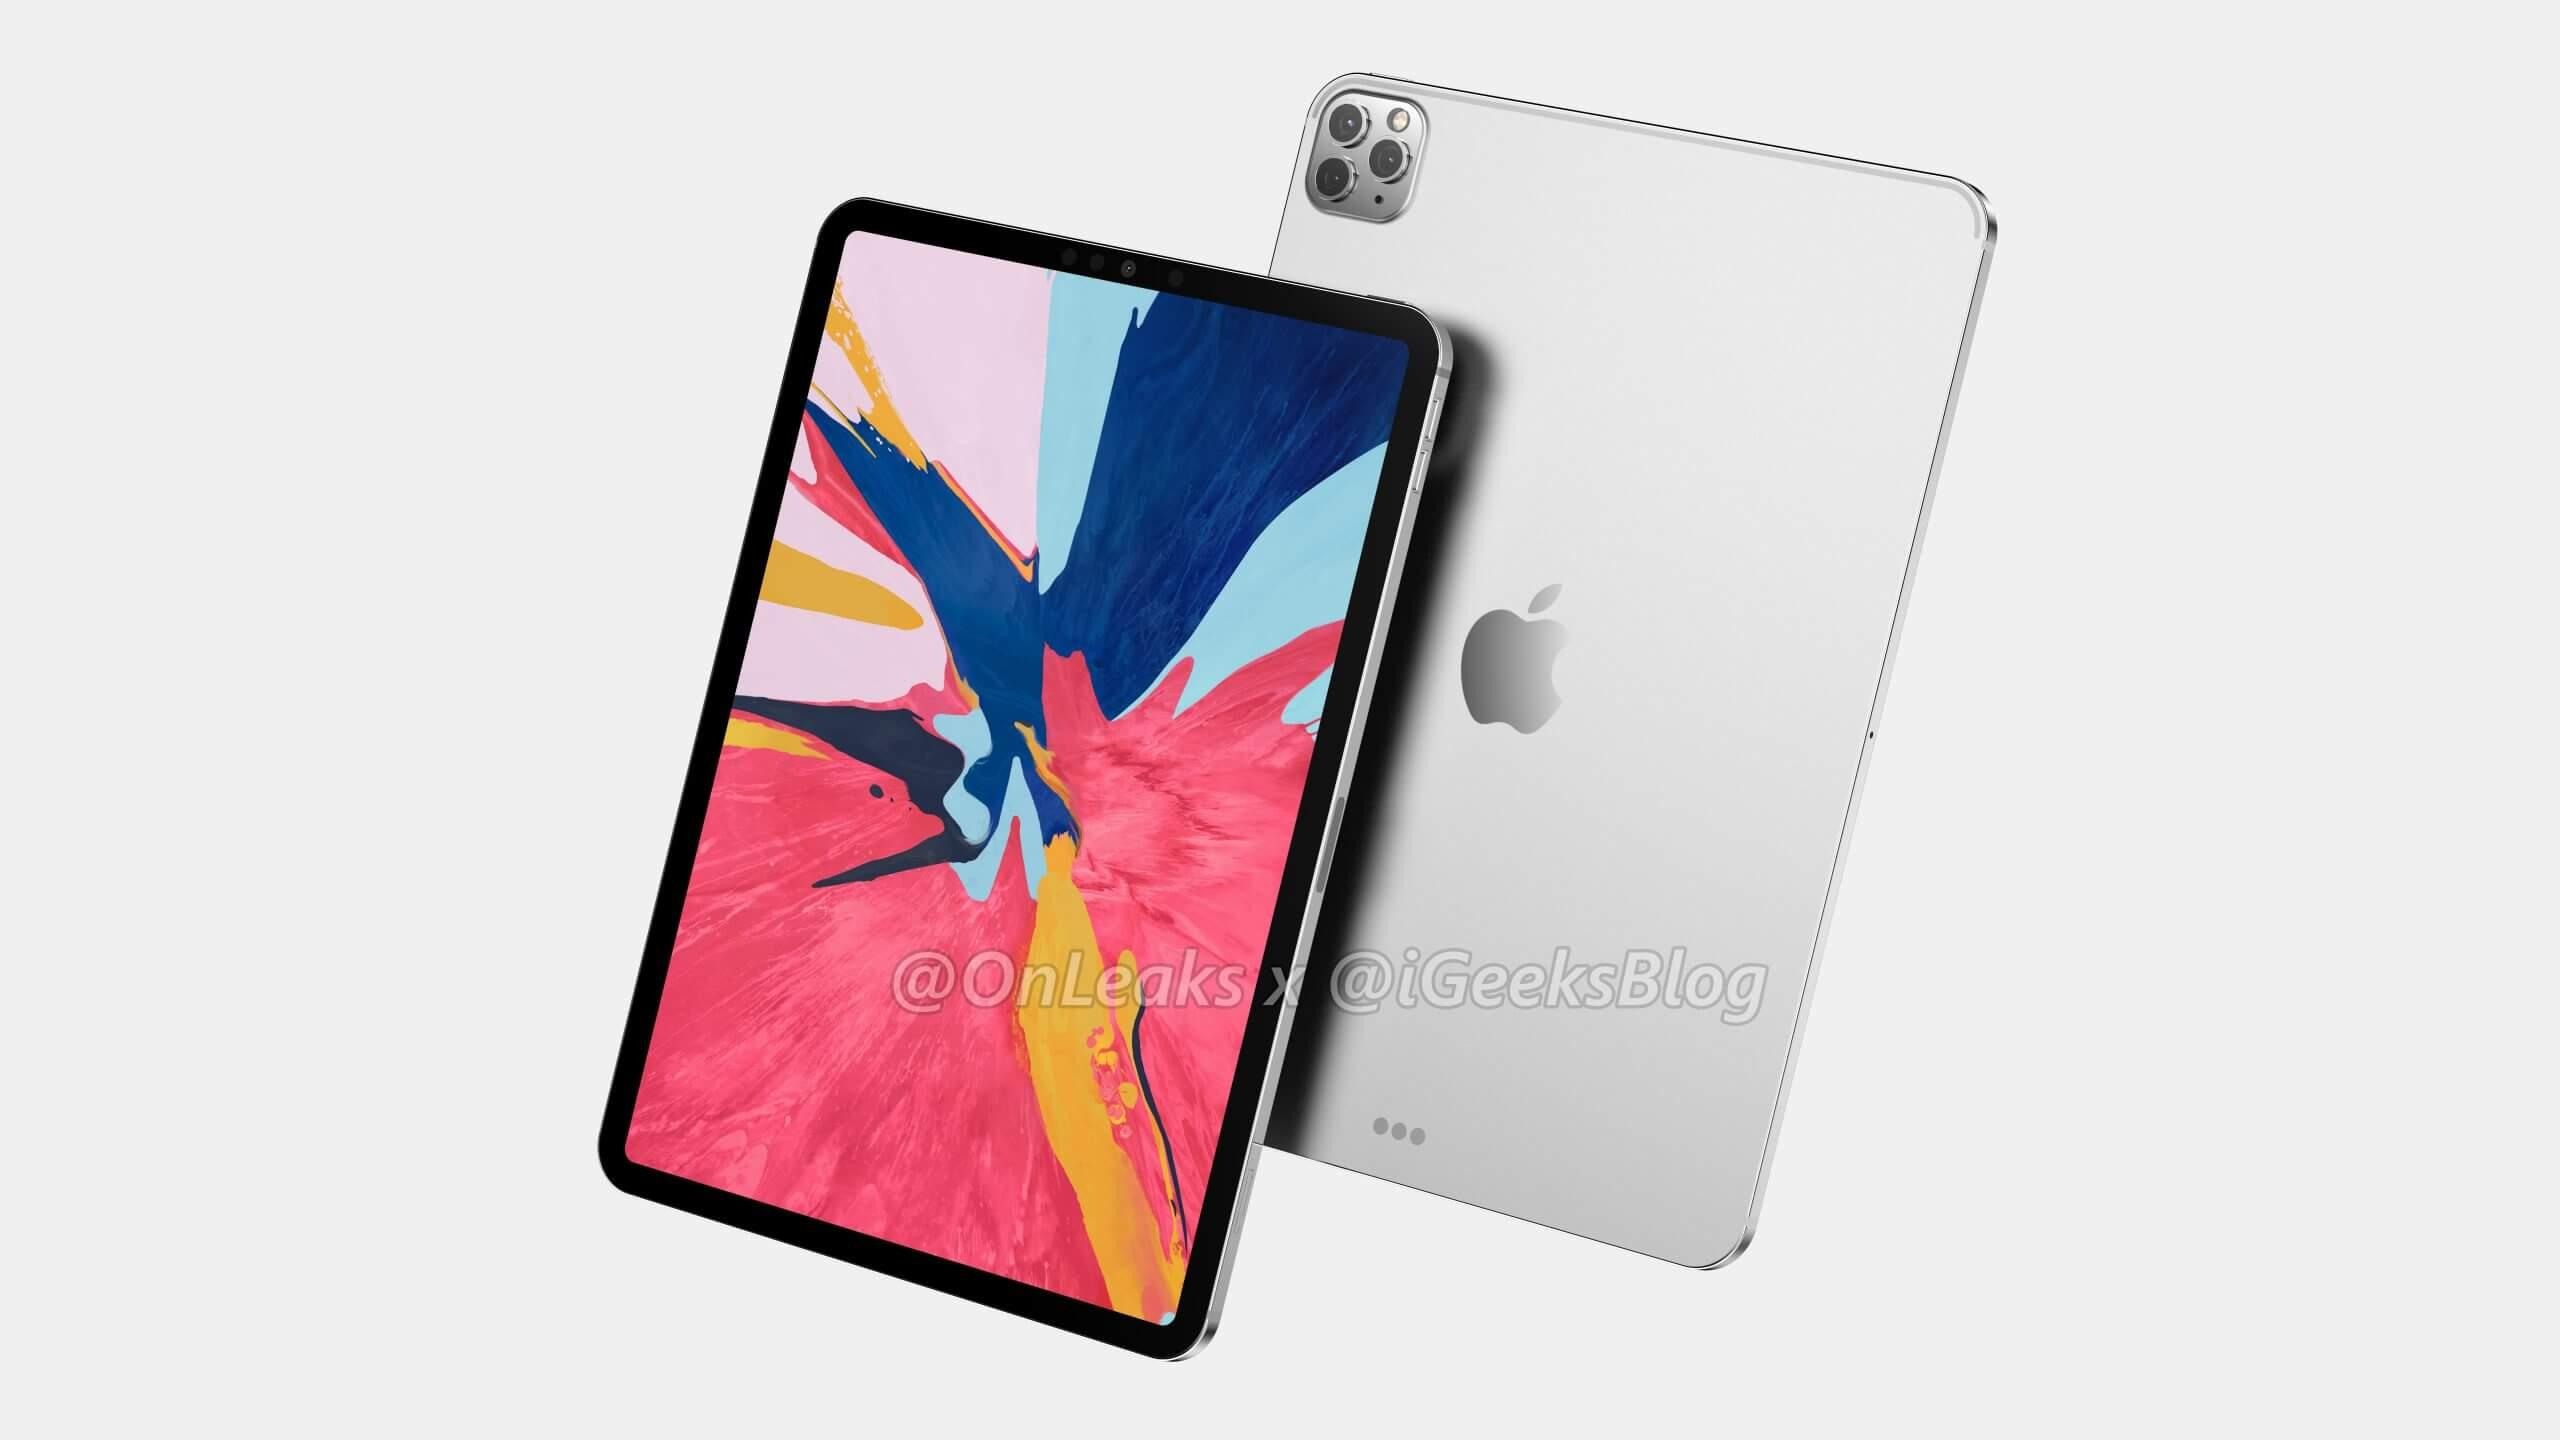 New render show 2020 11-inch iPad Pro